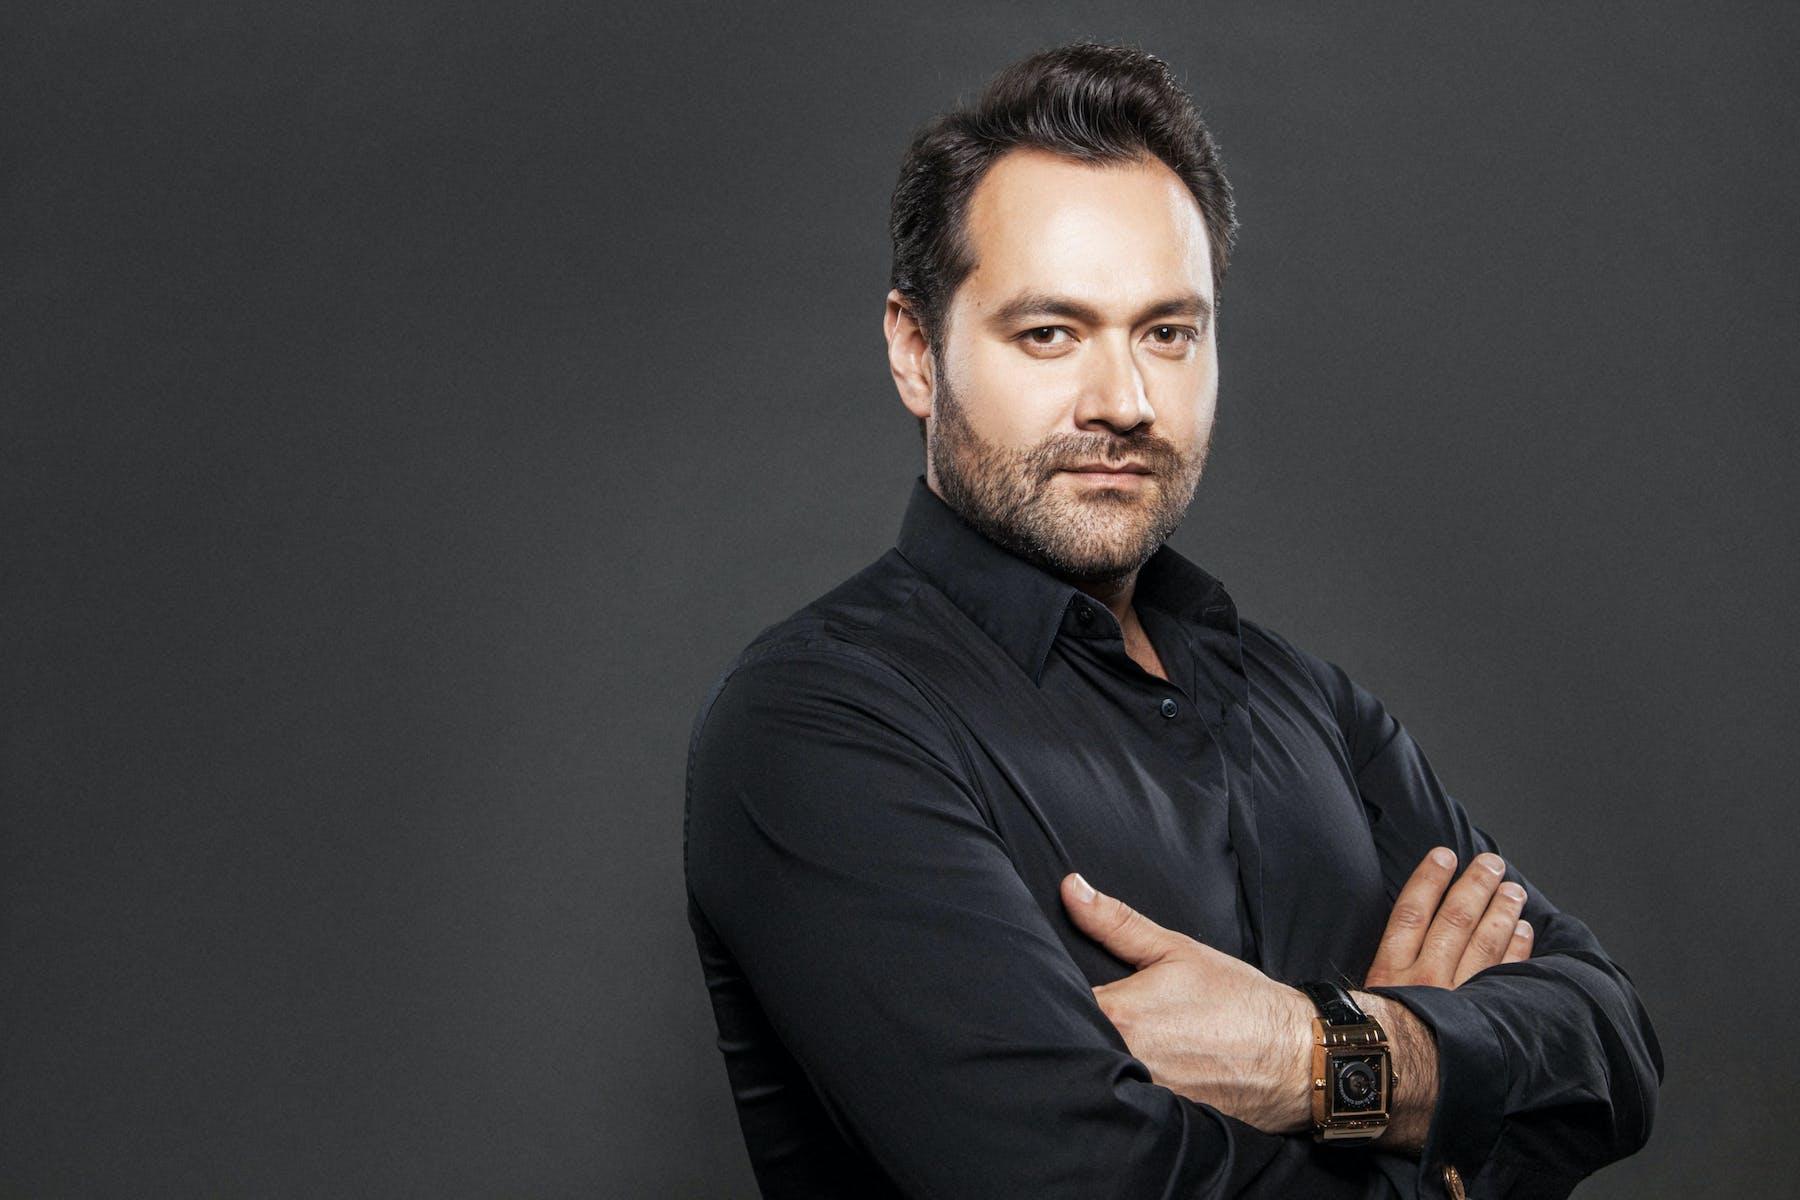 Ildar Abdrazakov, bass1